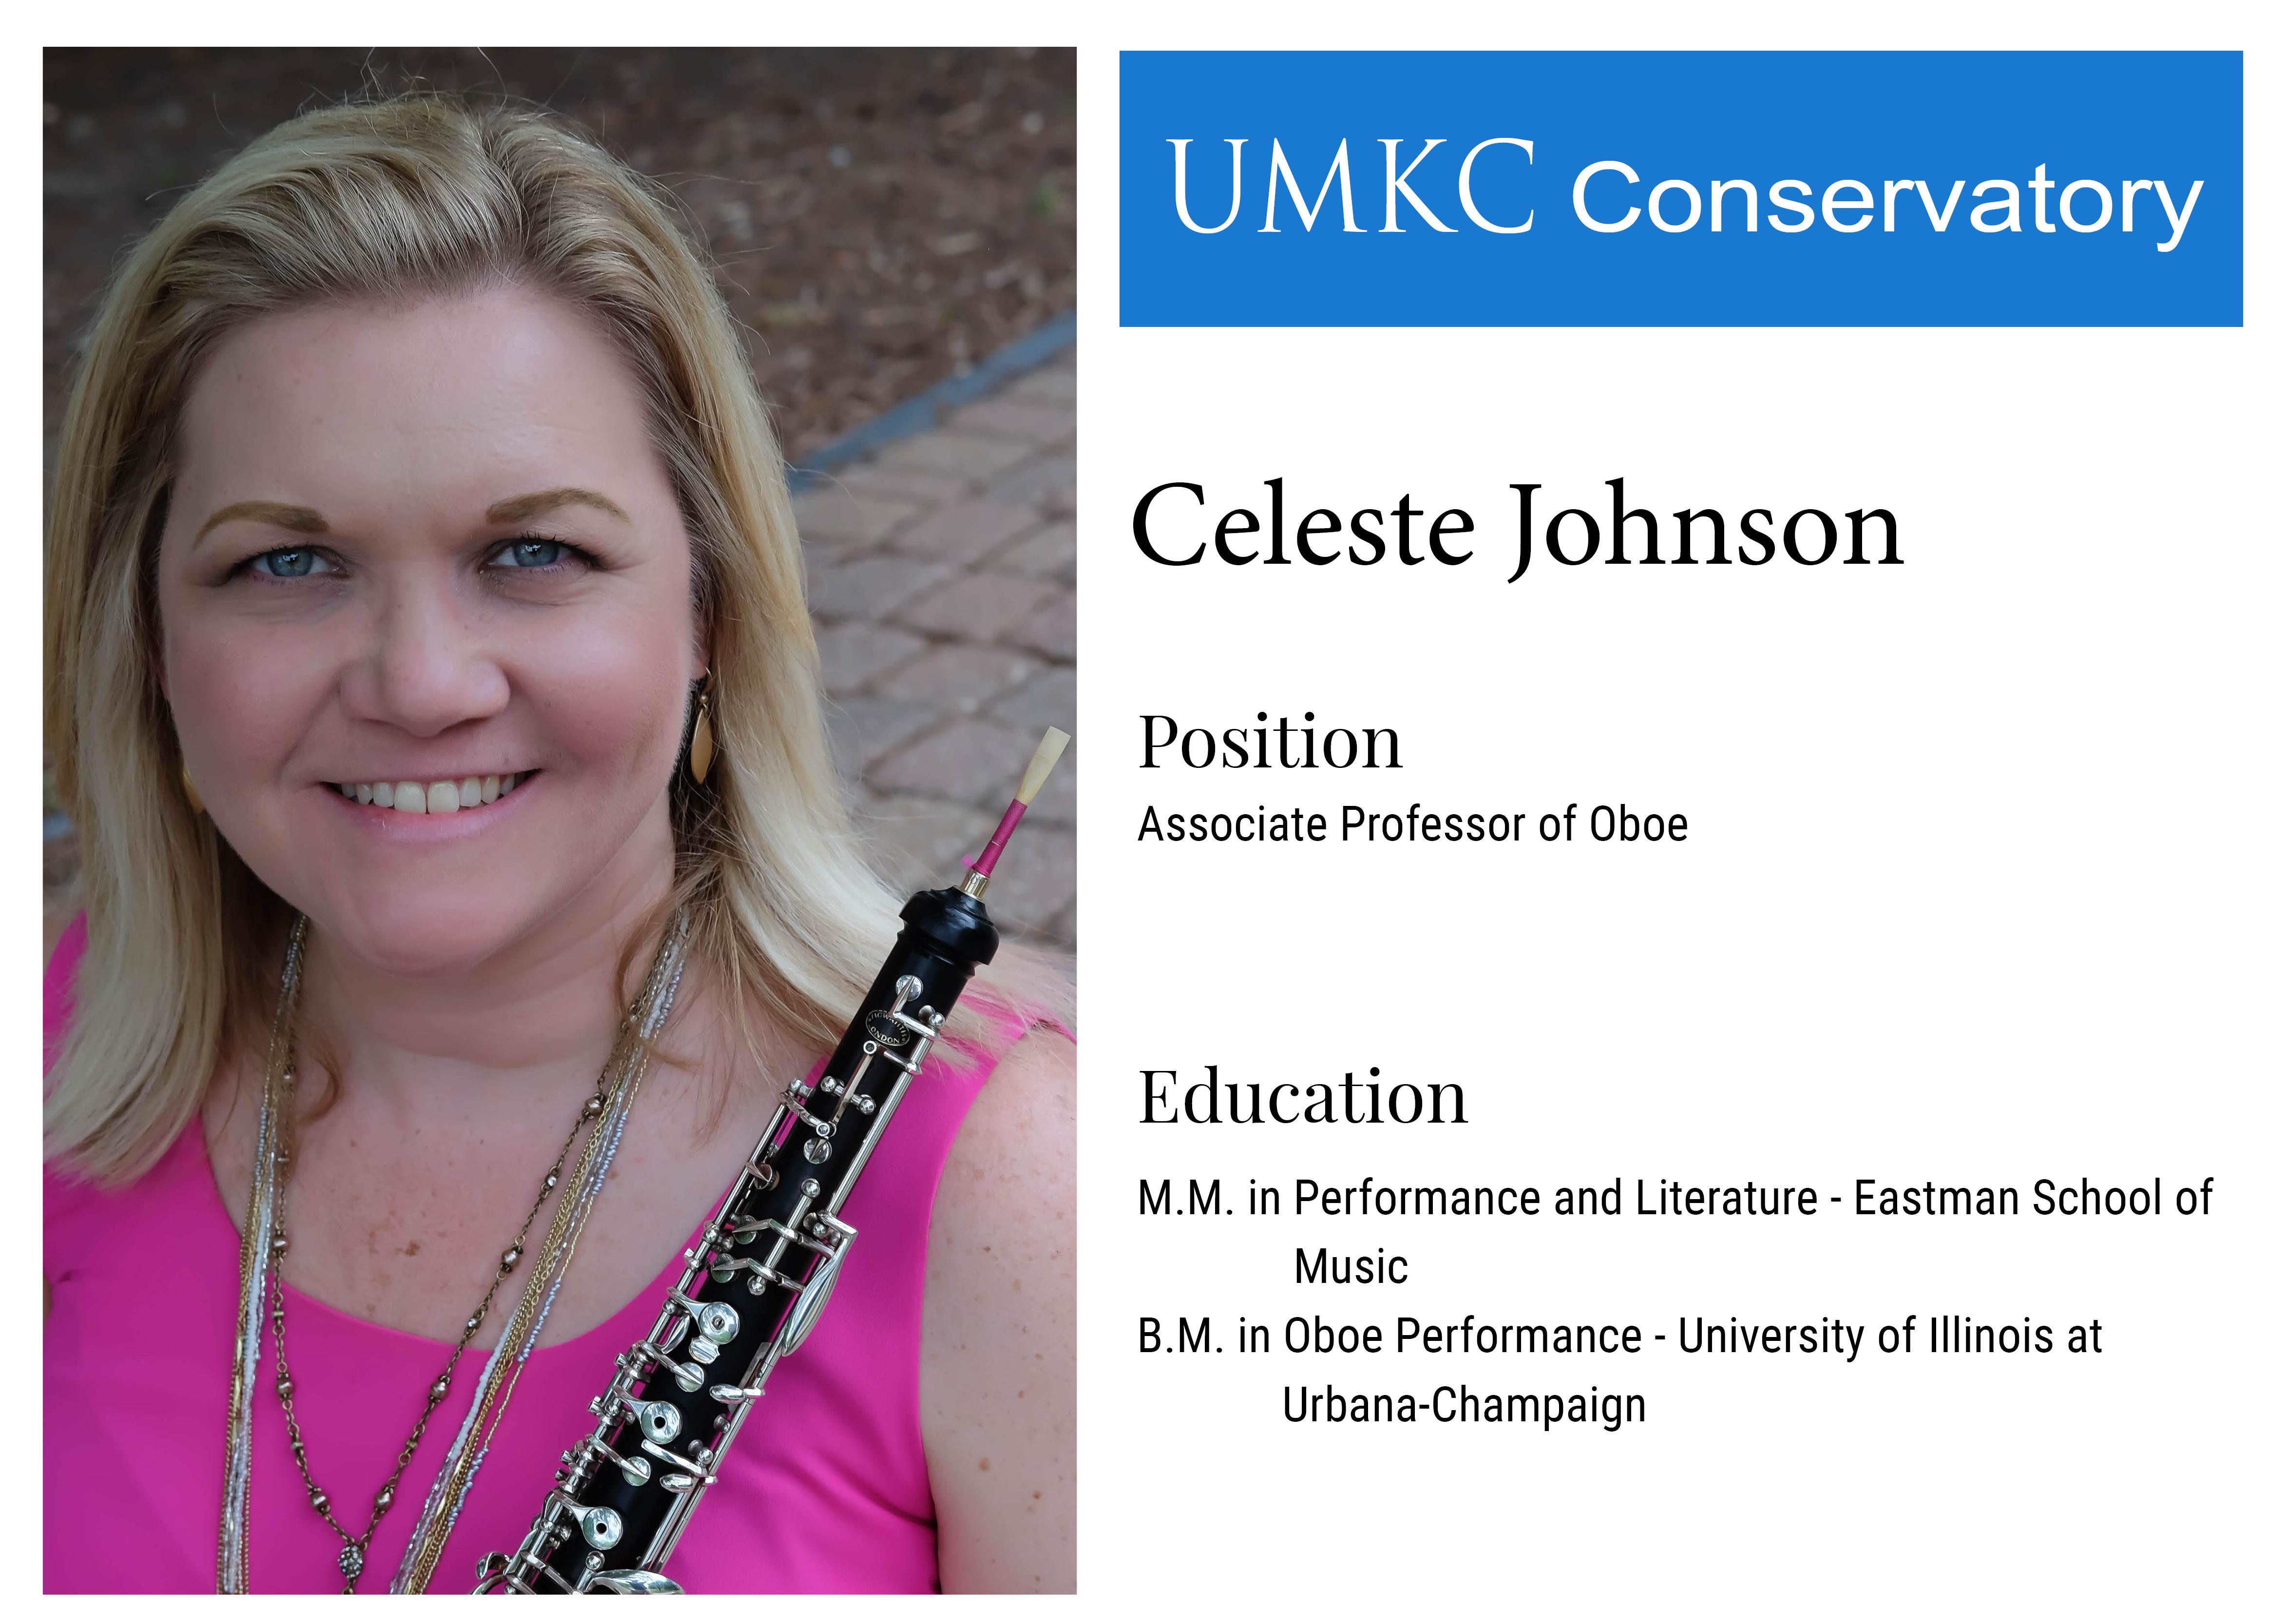 celeste-johnson-profile-card.jpg